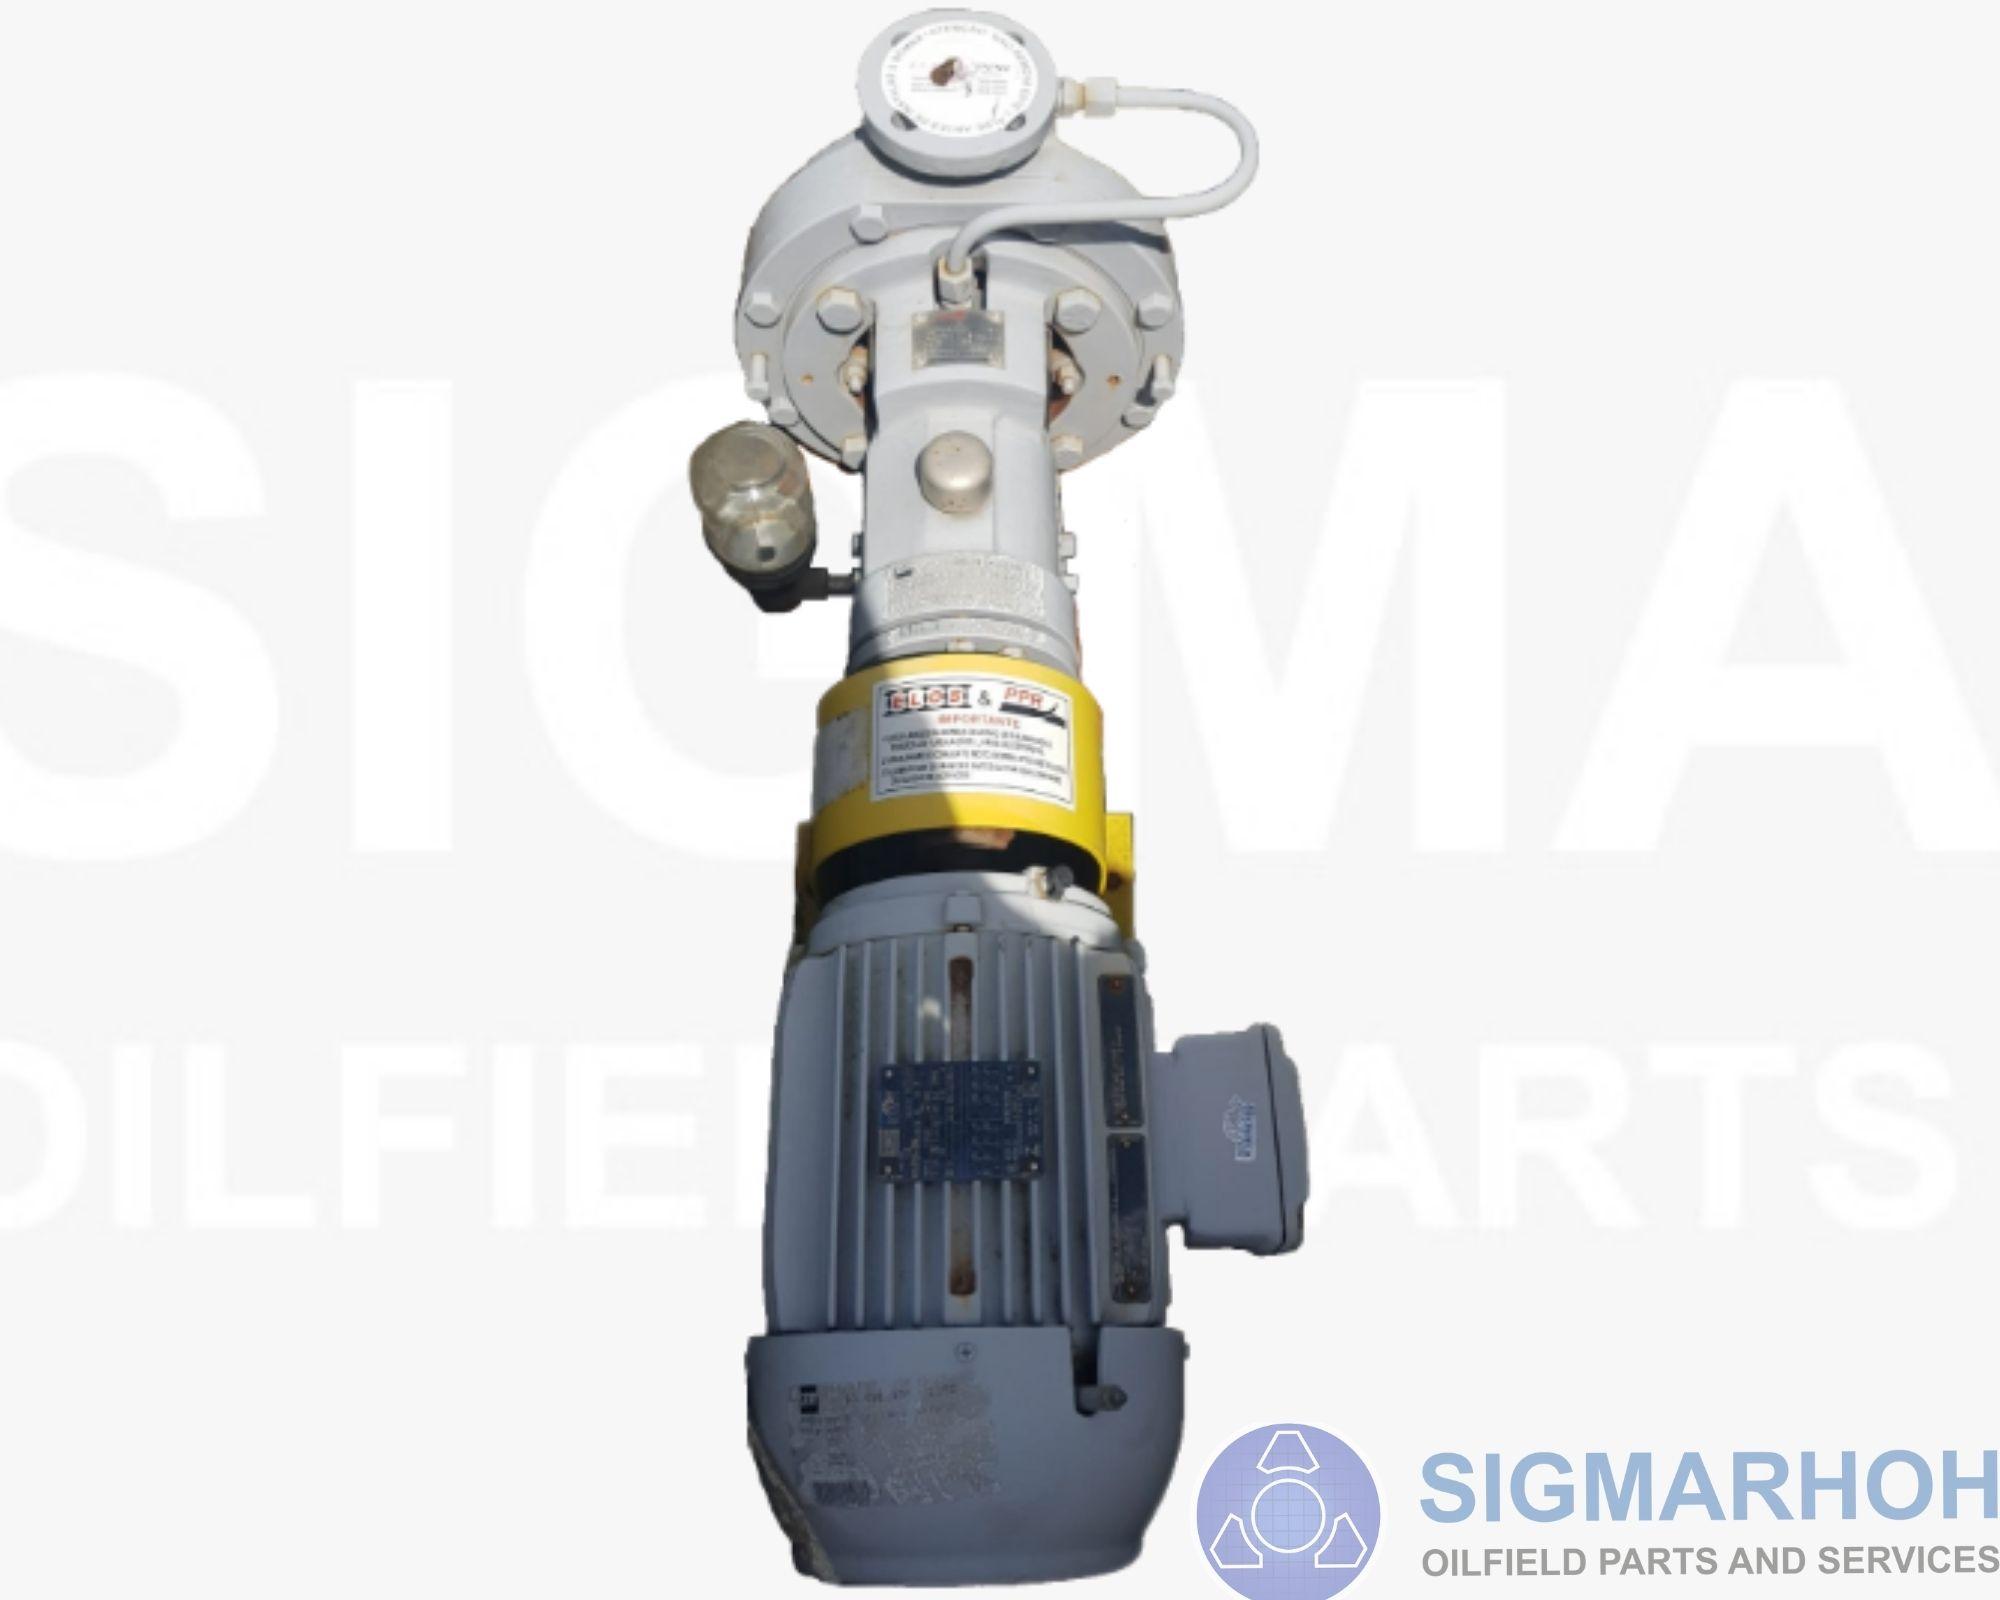 Motobomba Centrifuga Elos & PPR / Centrifugal Motorpump Elos & PPR